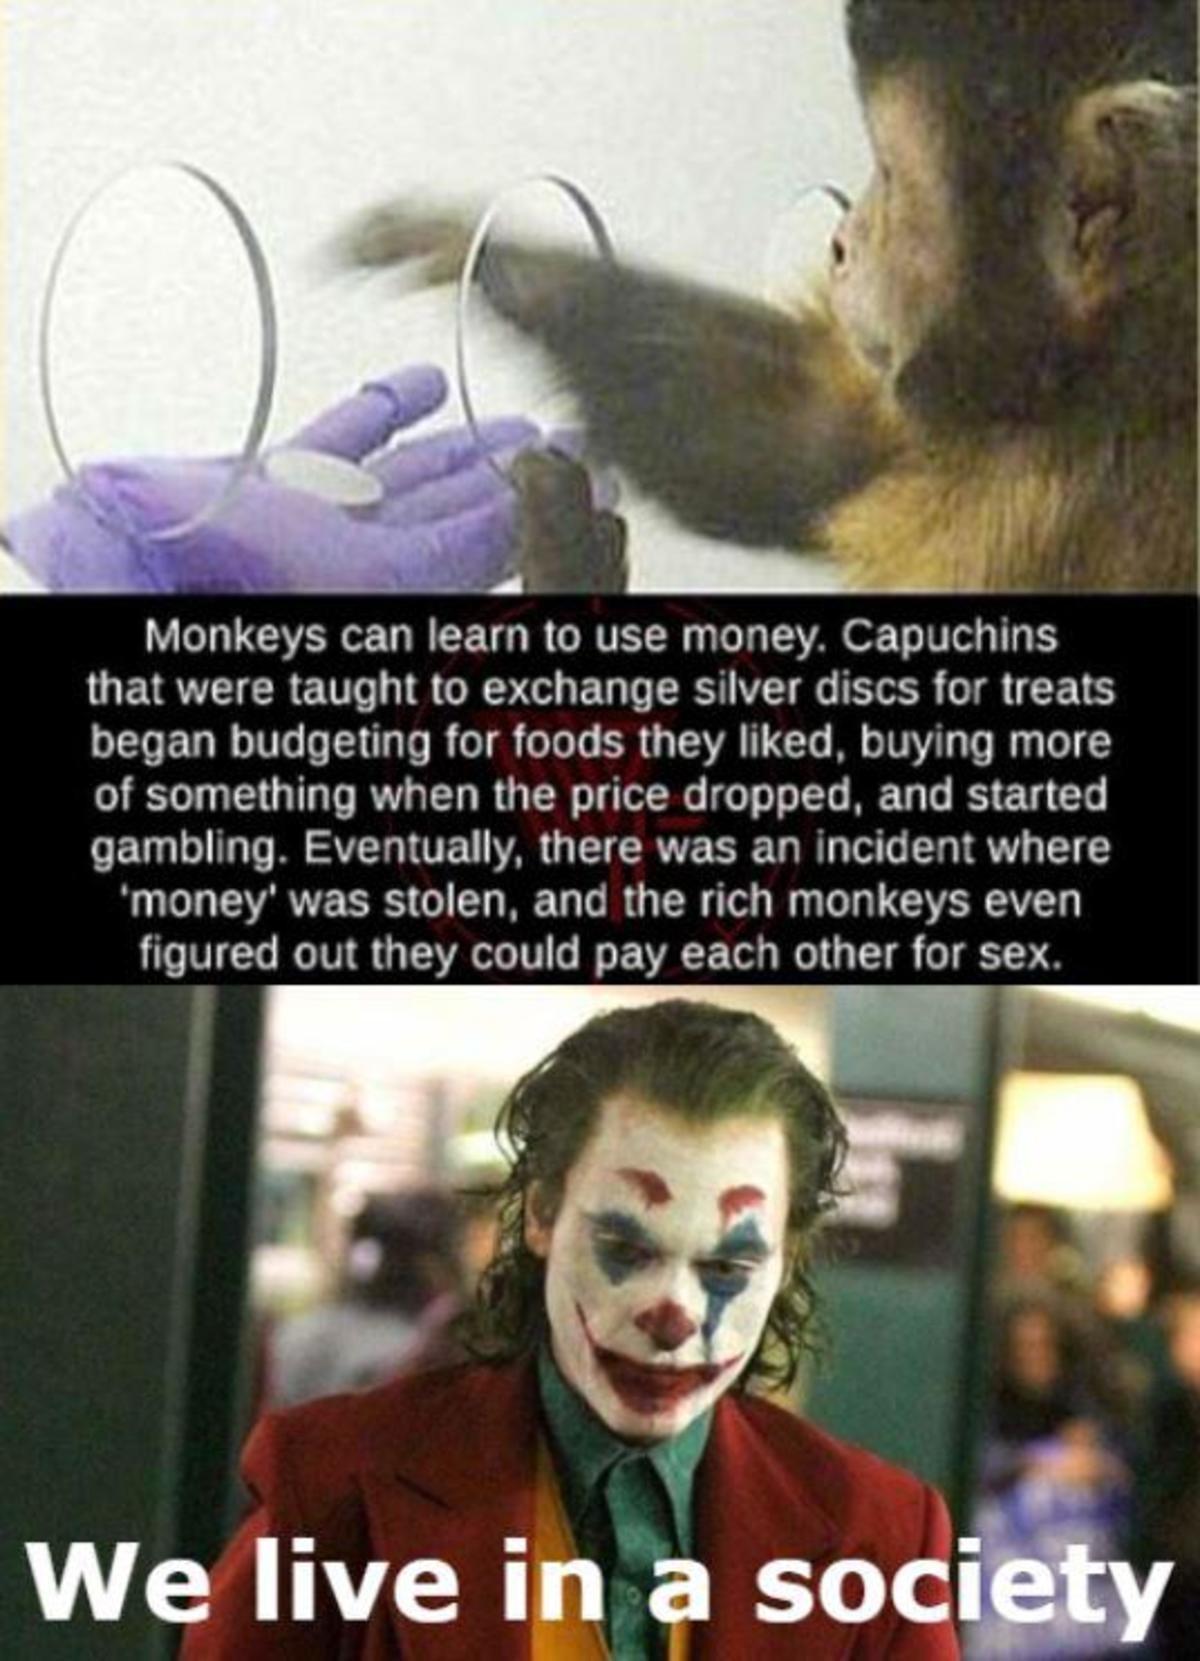 just like us... .. >teach monkeys how to use money >create mini chicago